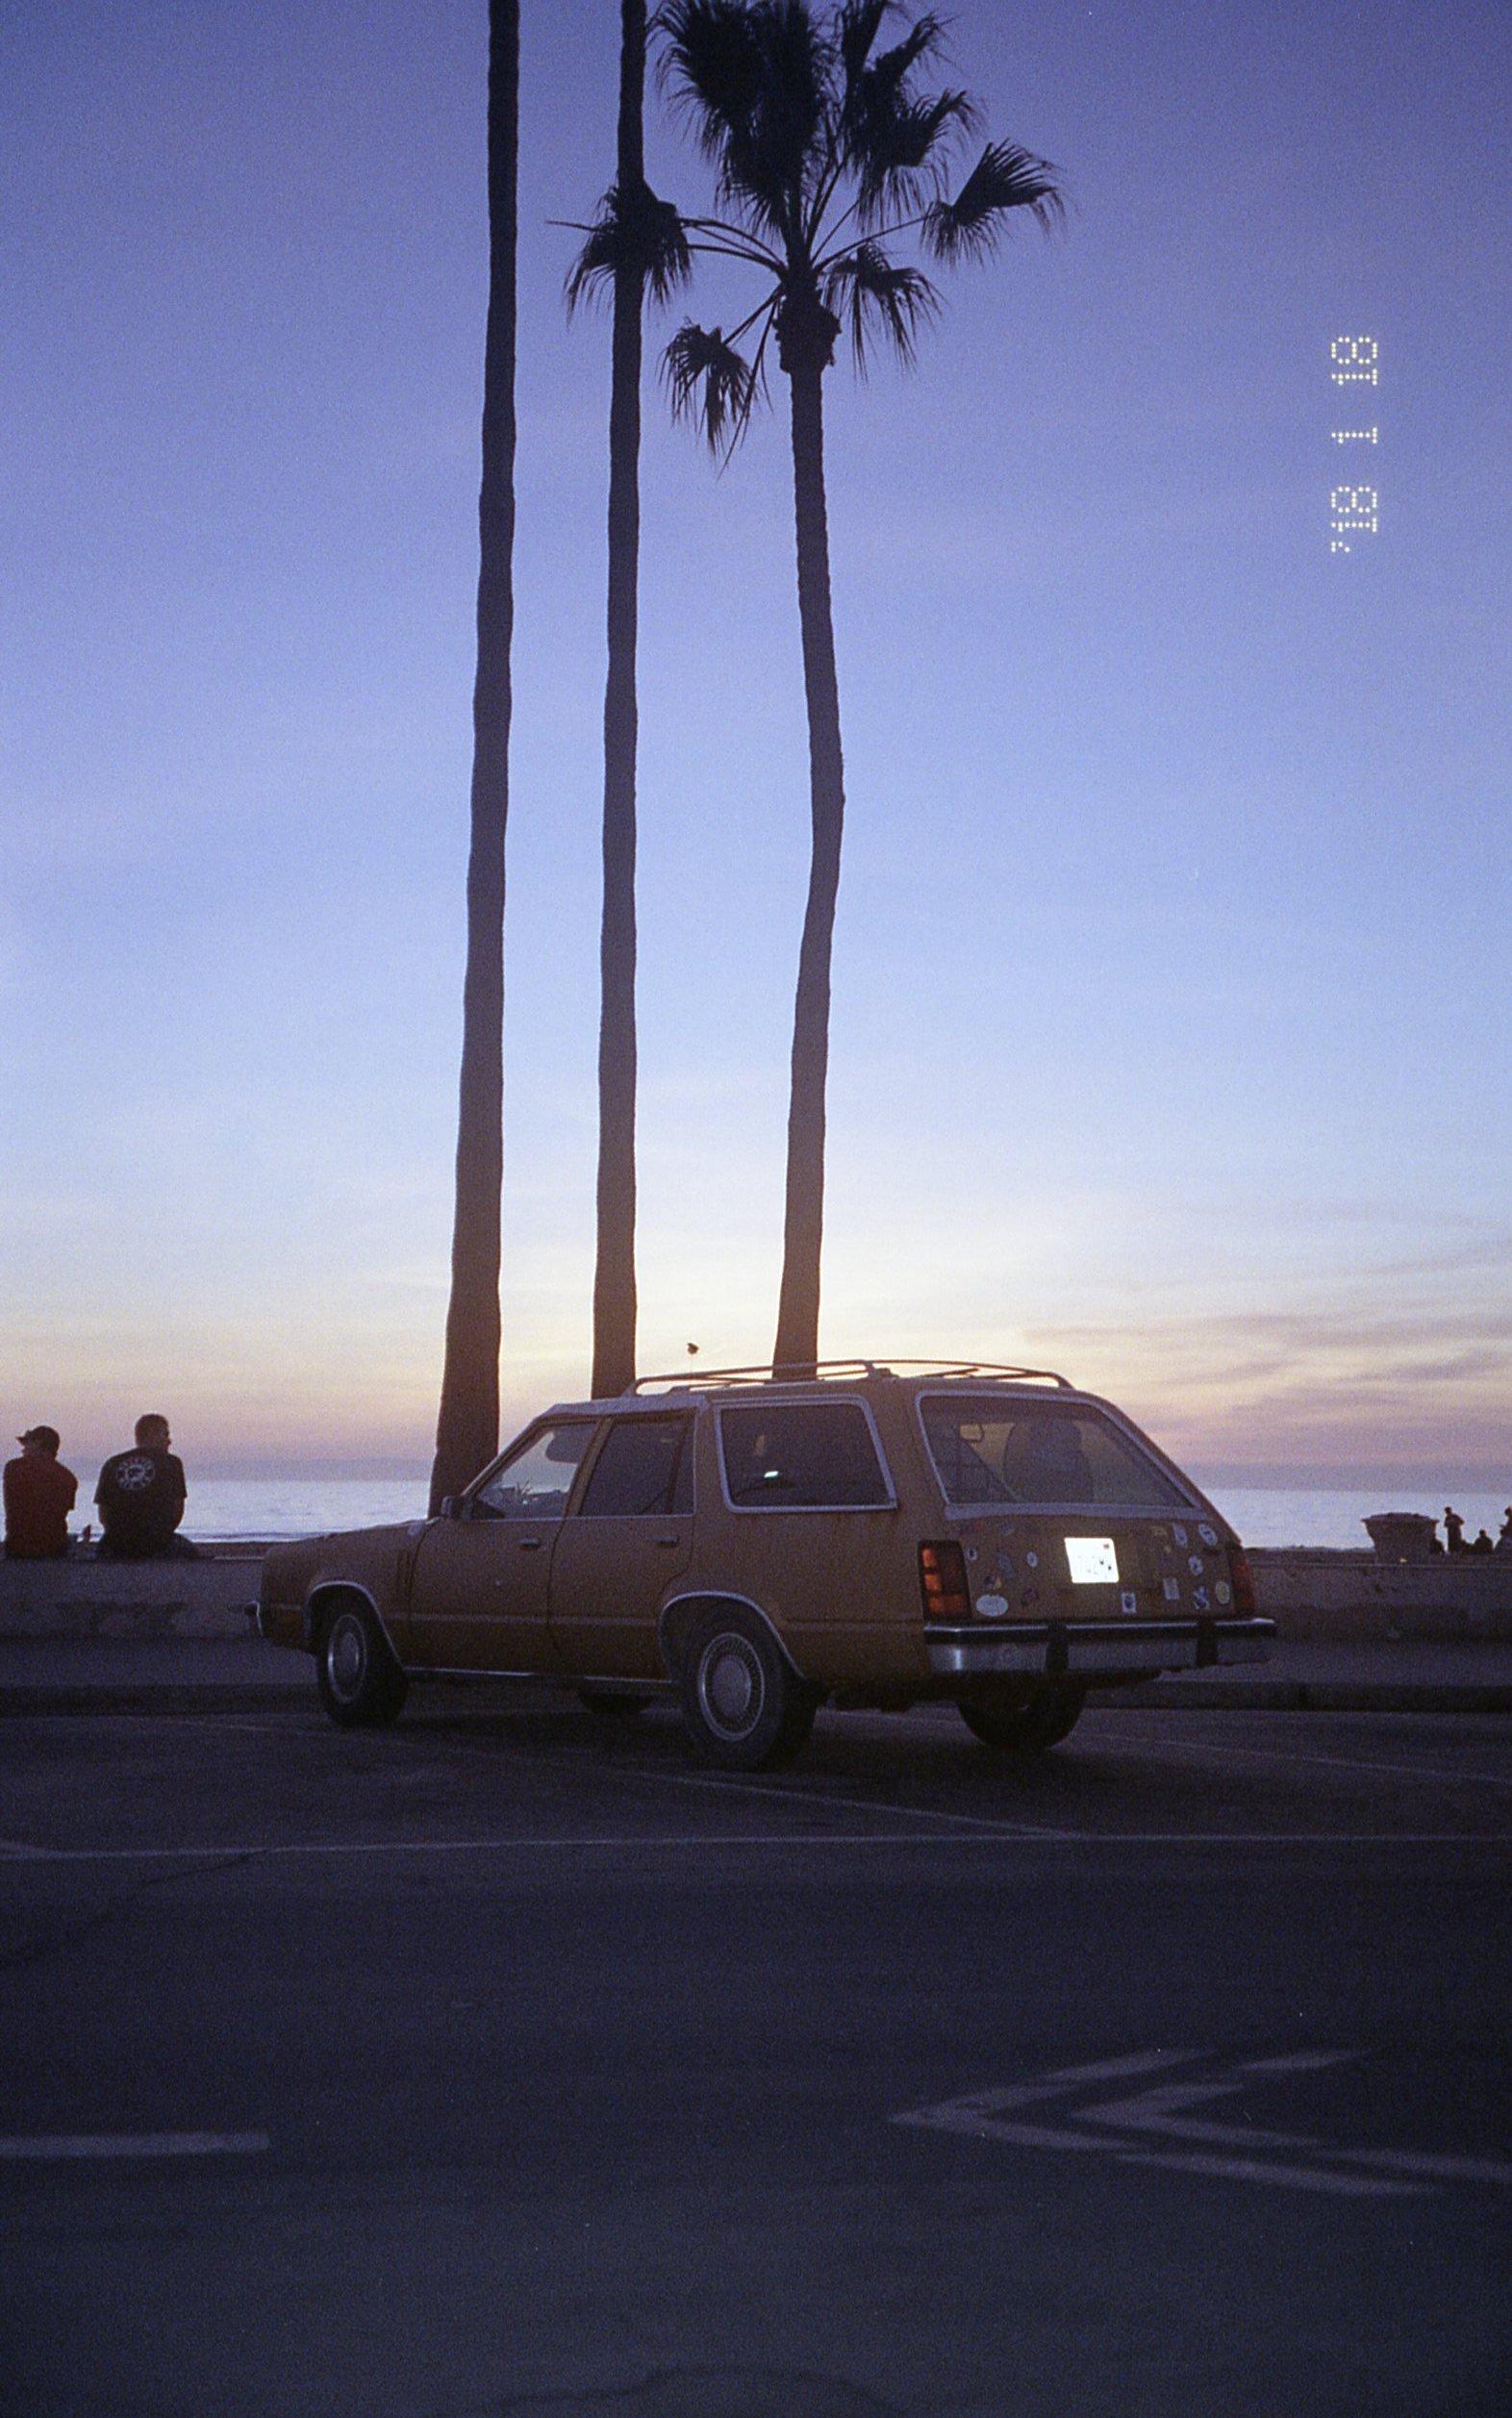 Kodak Gold 200 - The Top 10 Color Negative 35mm Film Stocks - FilterGrade